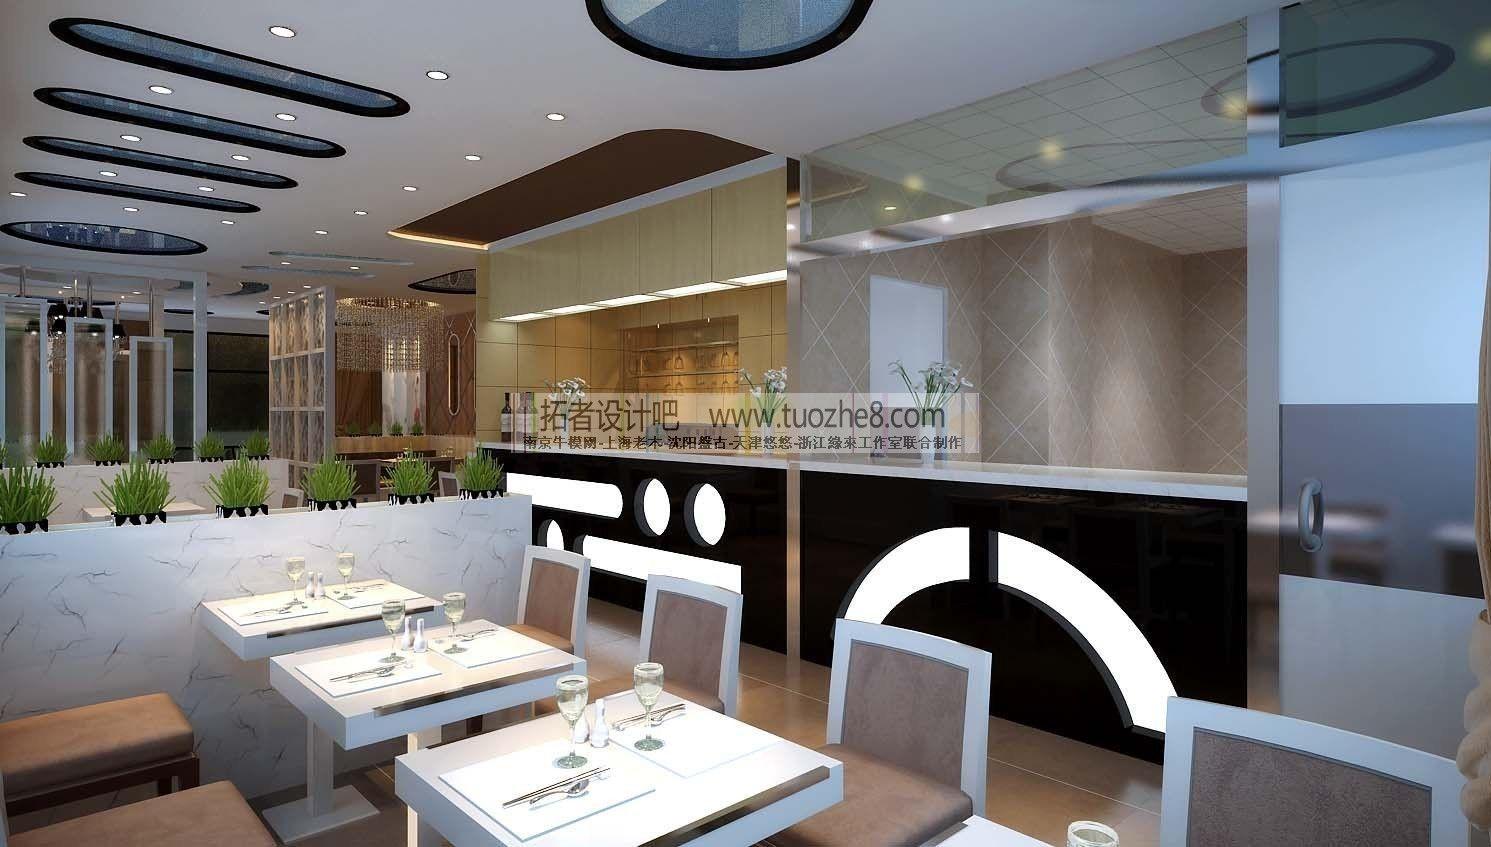 Outstanding kitchen and bathroom design models pics design ideas dievoon - Kitchen and bathroom design models ...